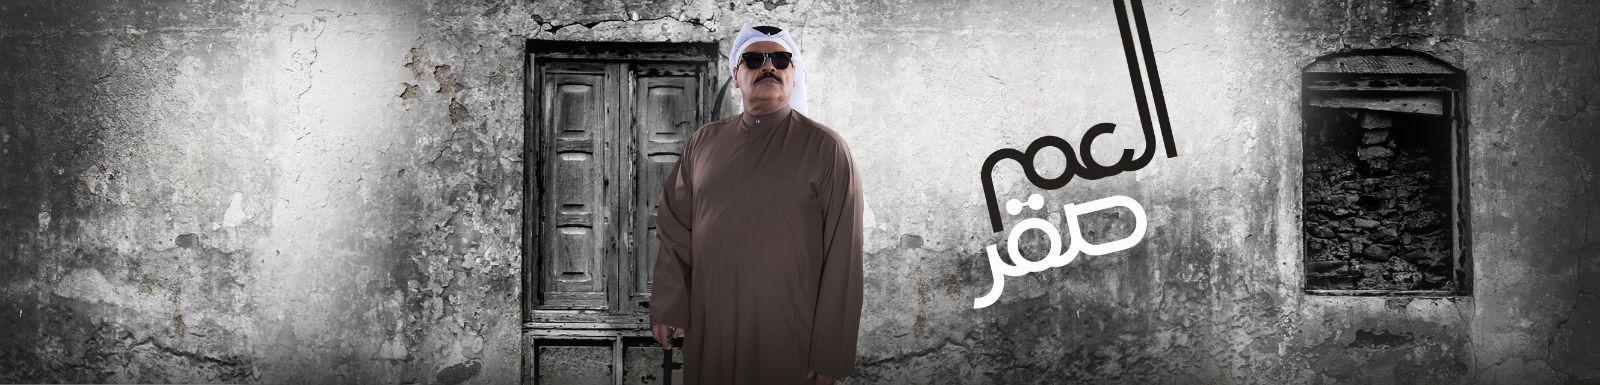 ����� ����� ���� ��� ������ 6 MBC shahid ���� ��